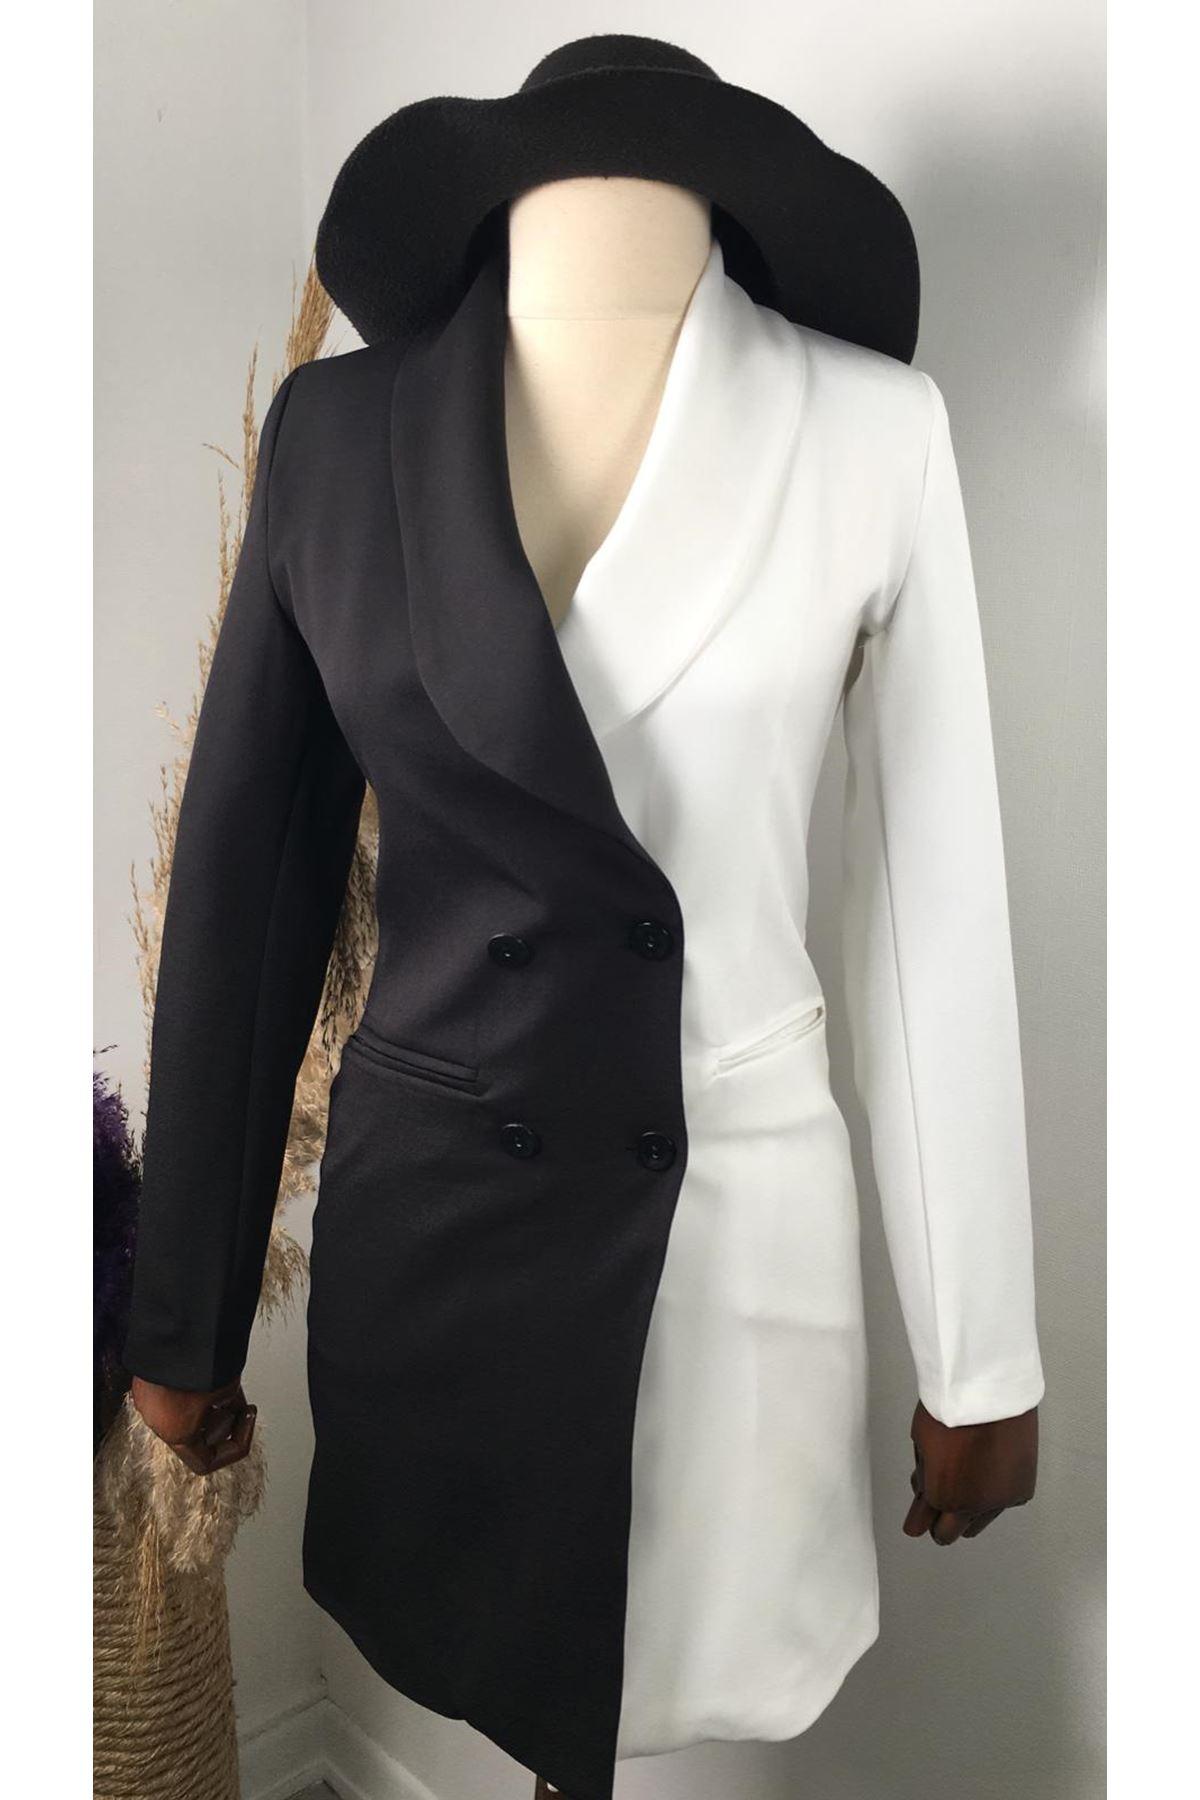 Çift Renk Garnili Vatkalı Ceket Elbise - Multi